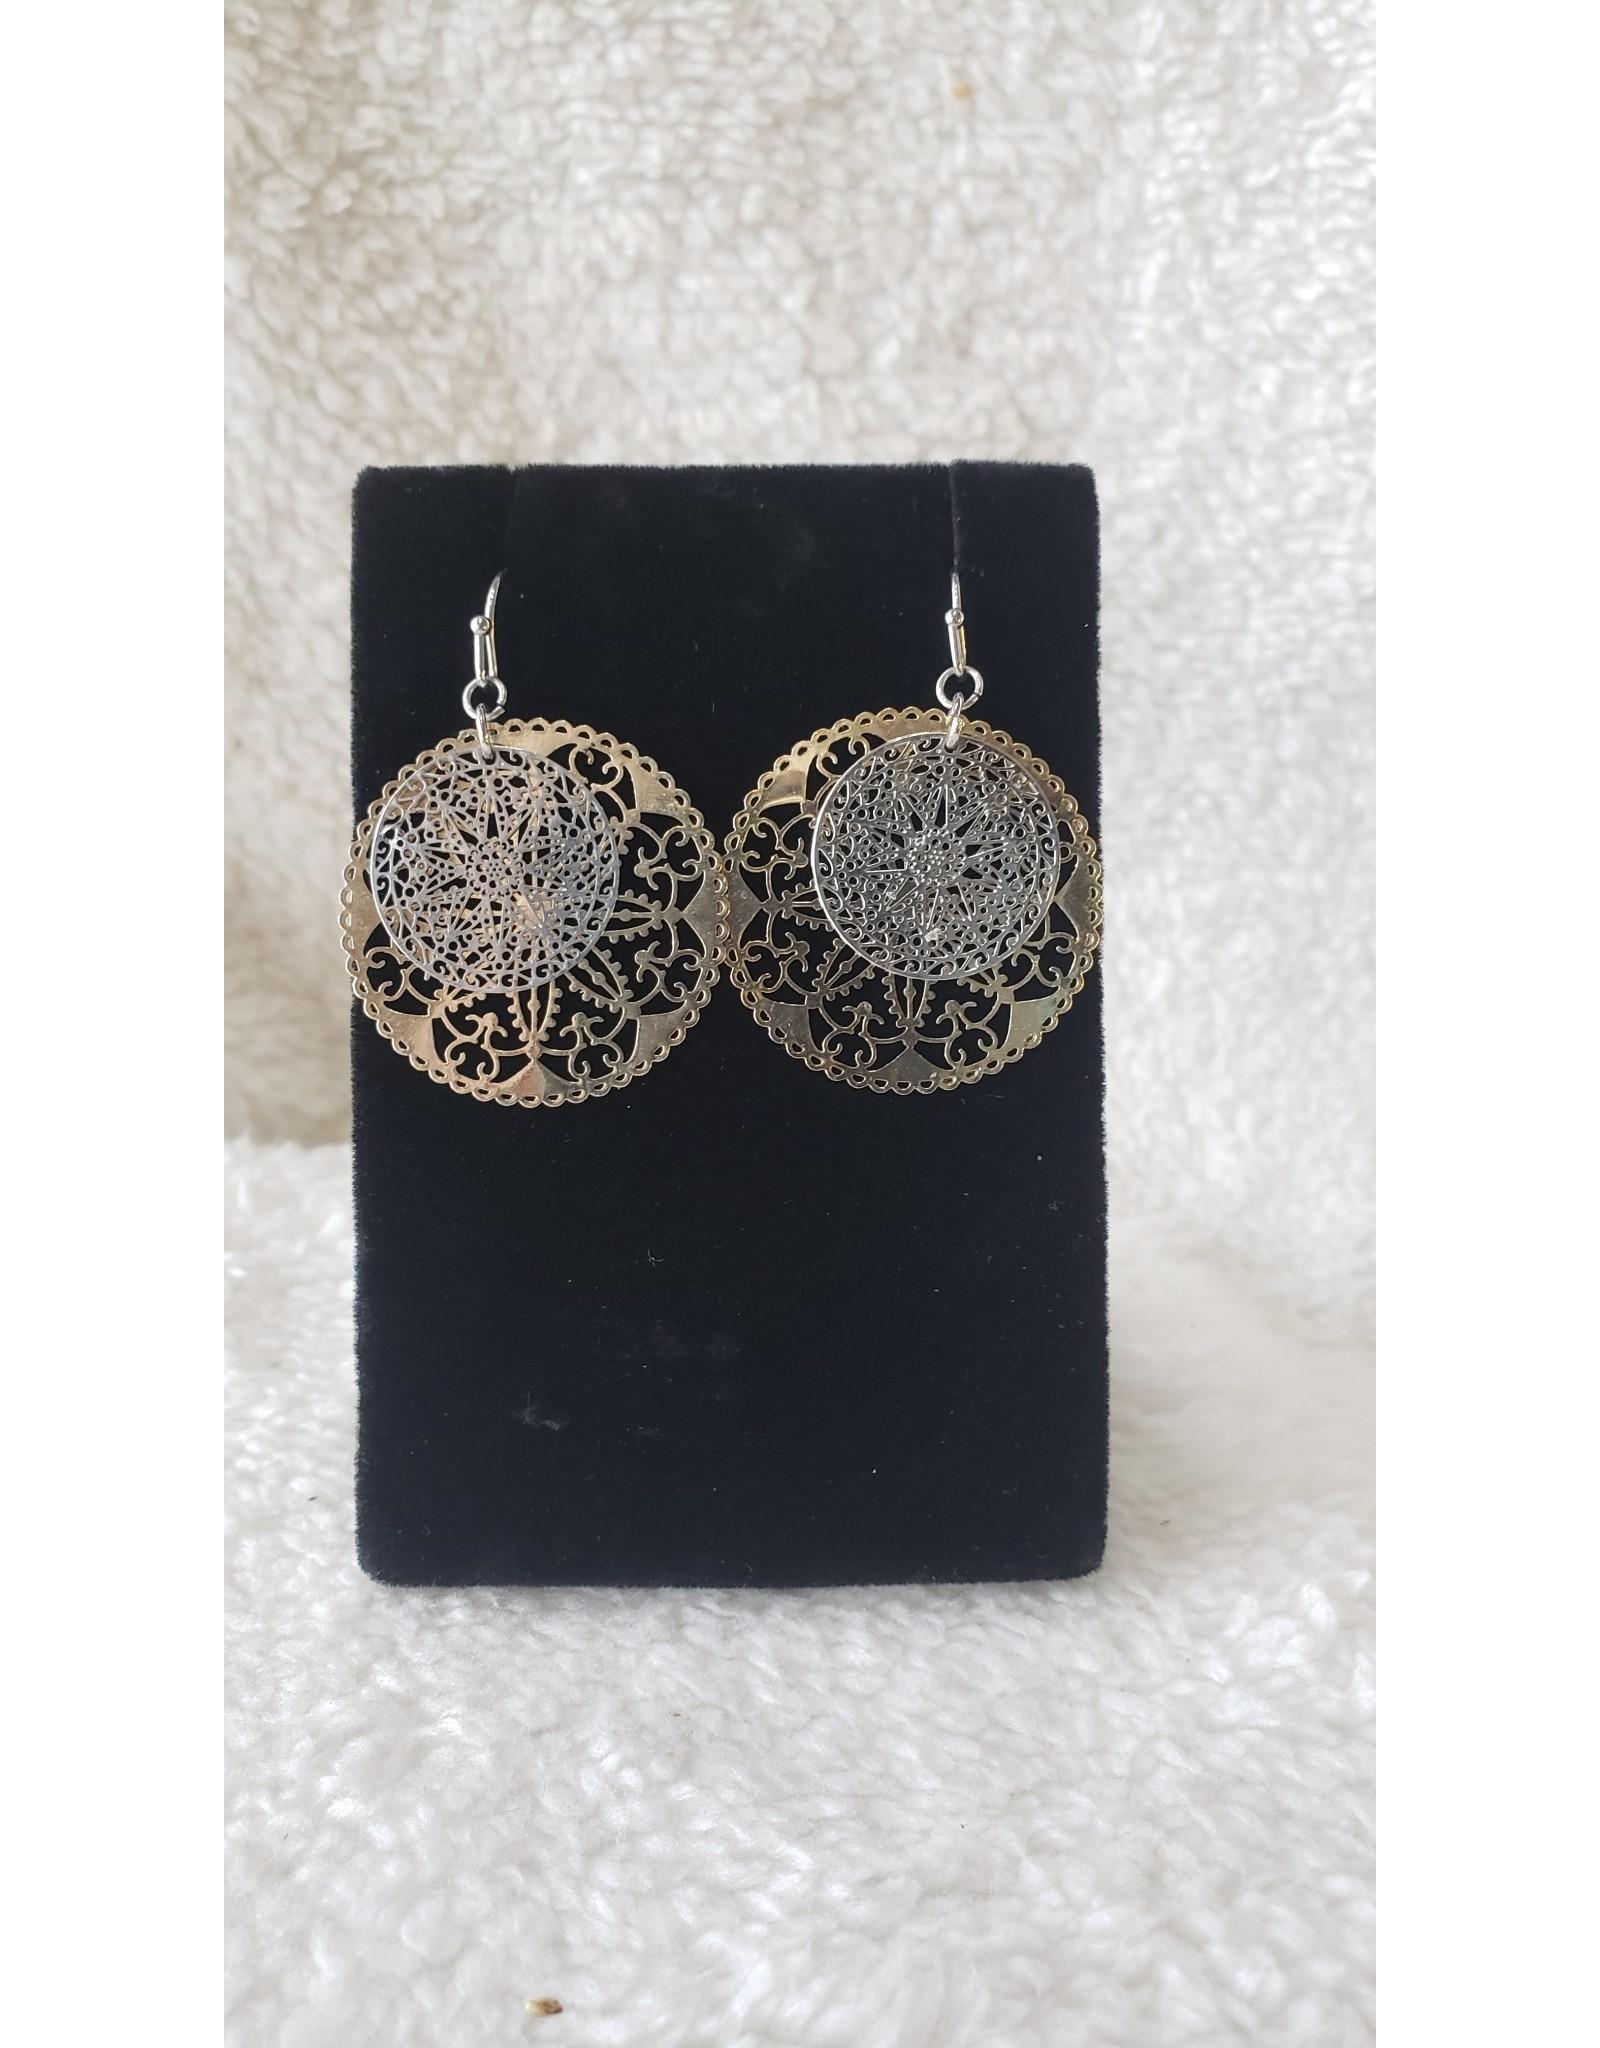 Silver & Gold Cutout Earrings